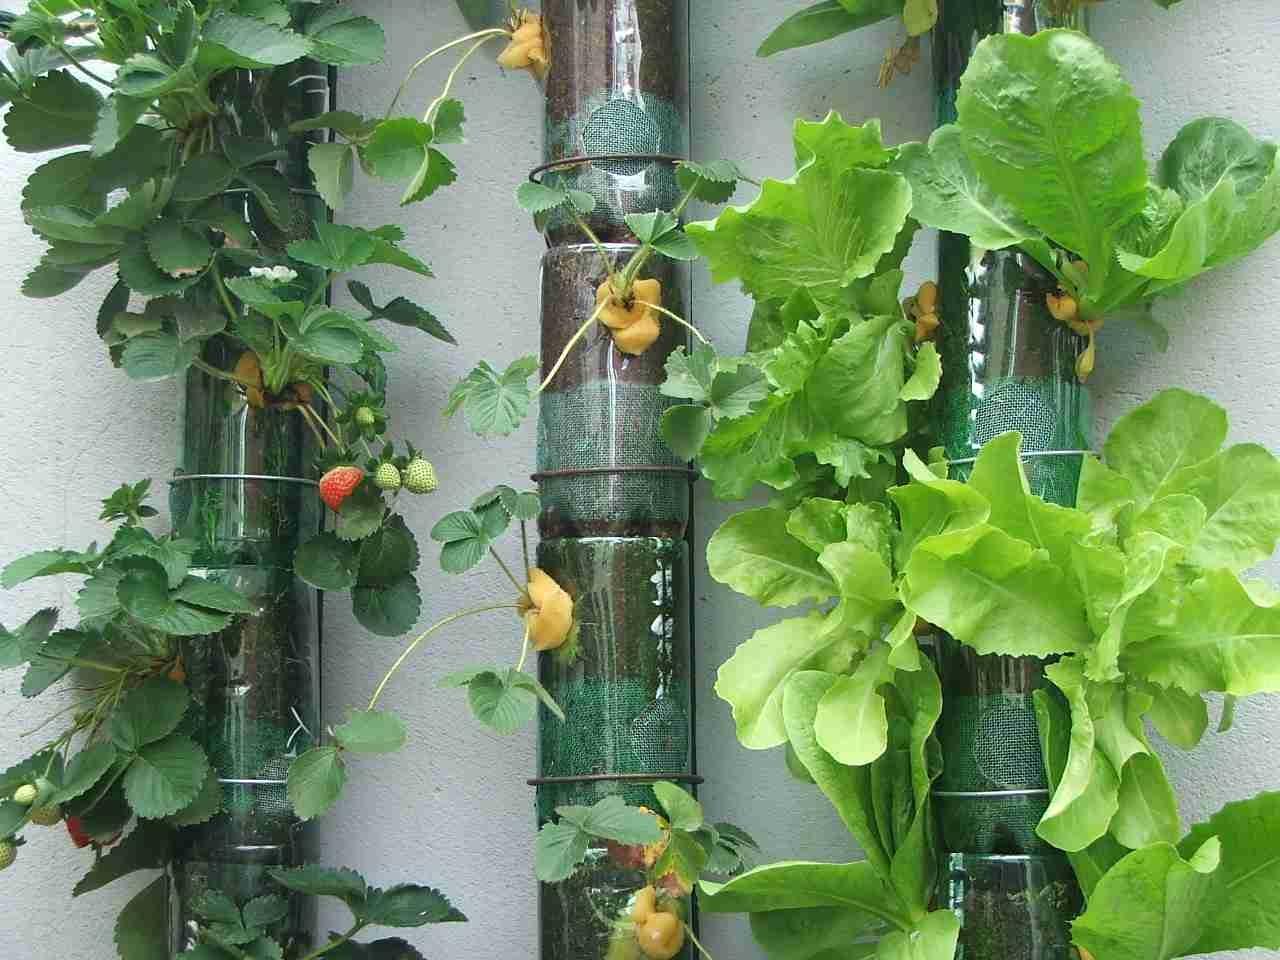 fazer jardim vertical garrafa pet:Fearless: Jardim vertical de garrafas pet